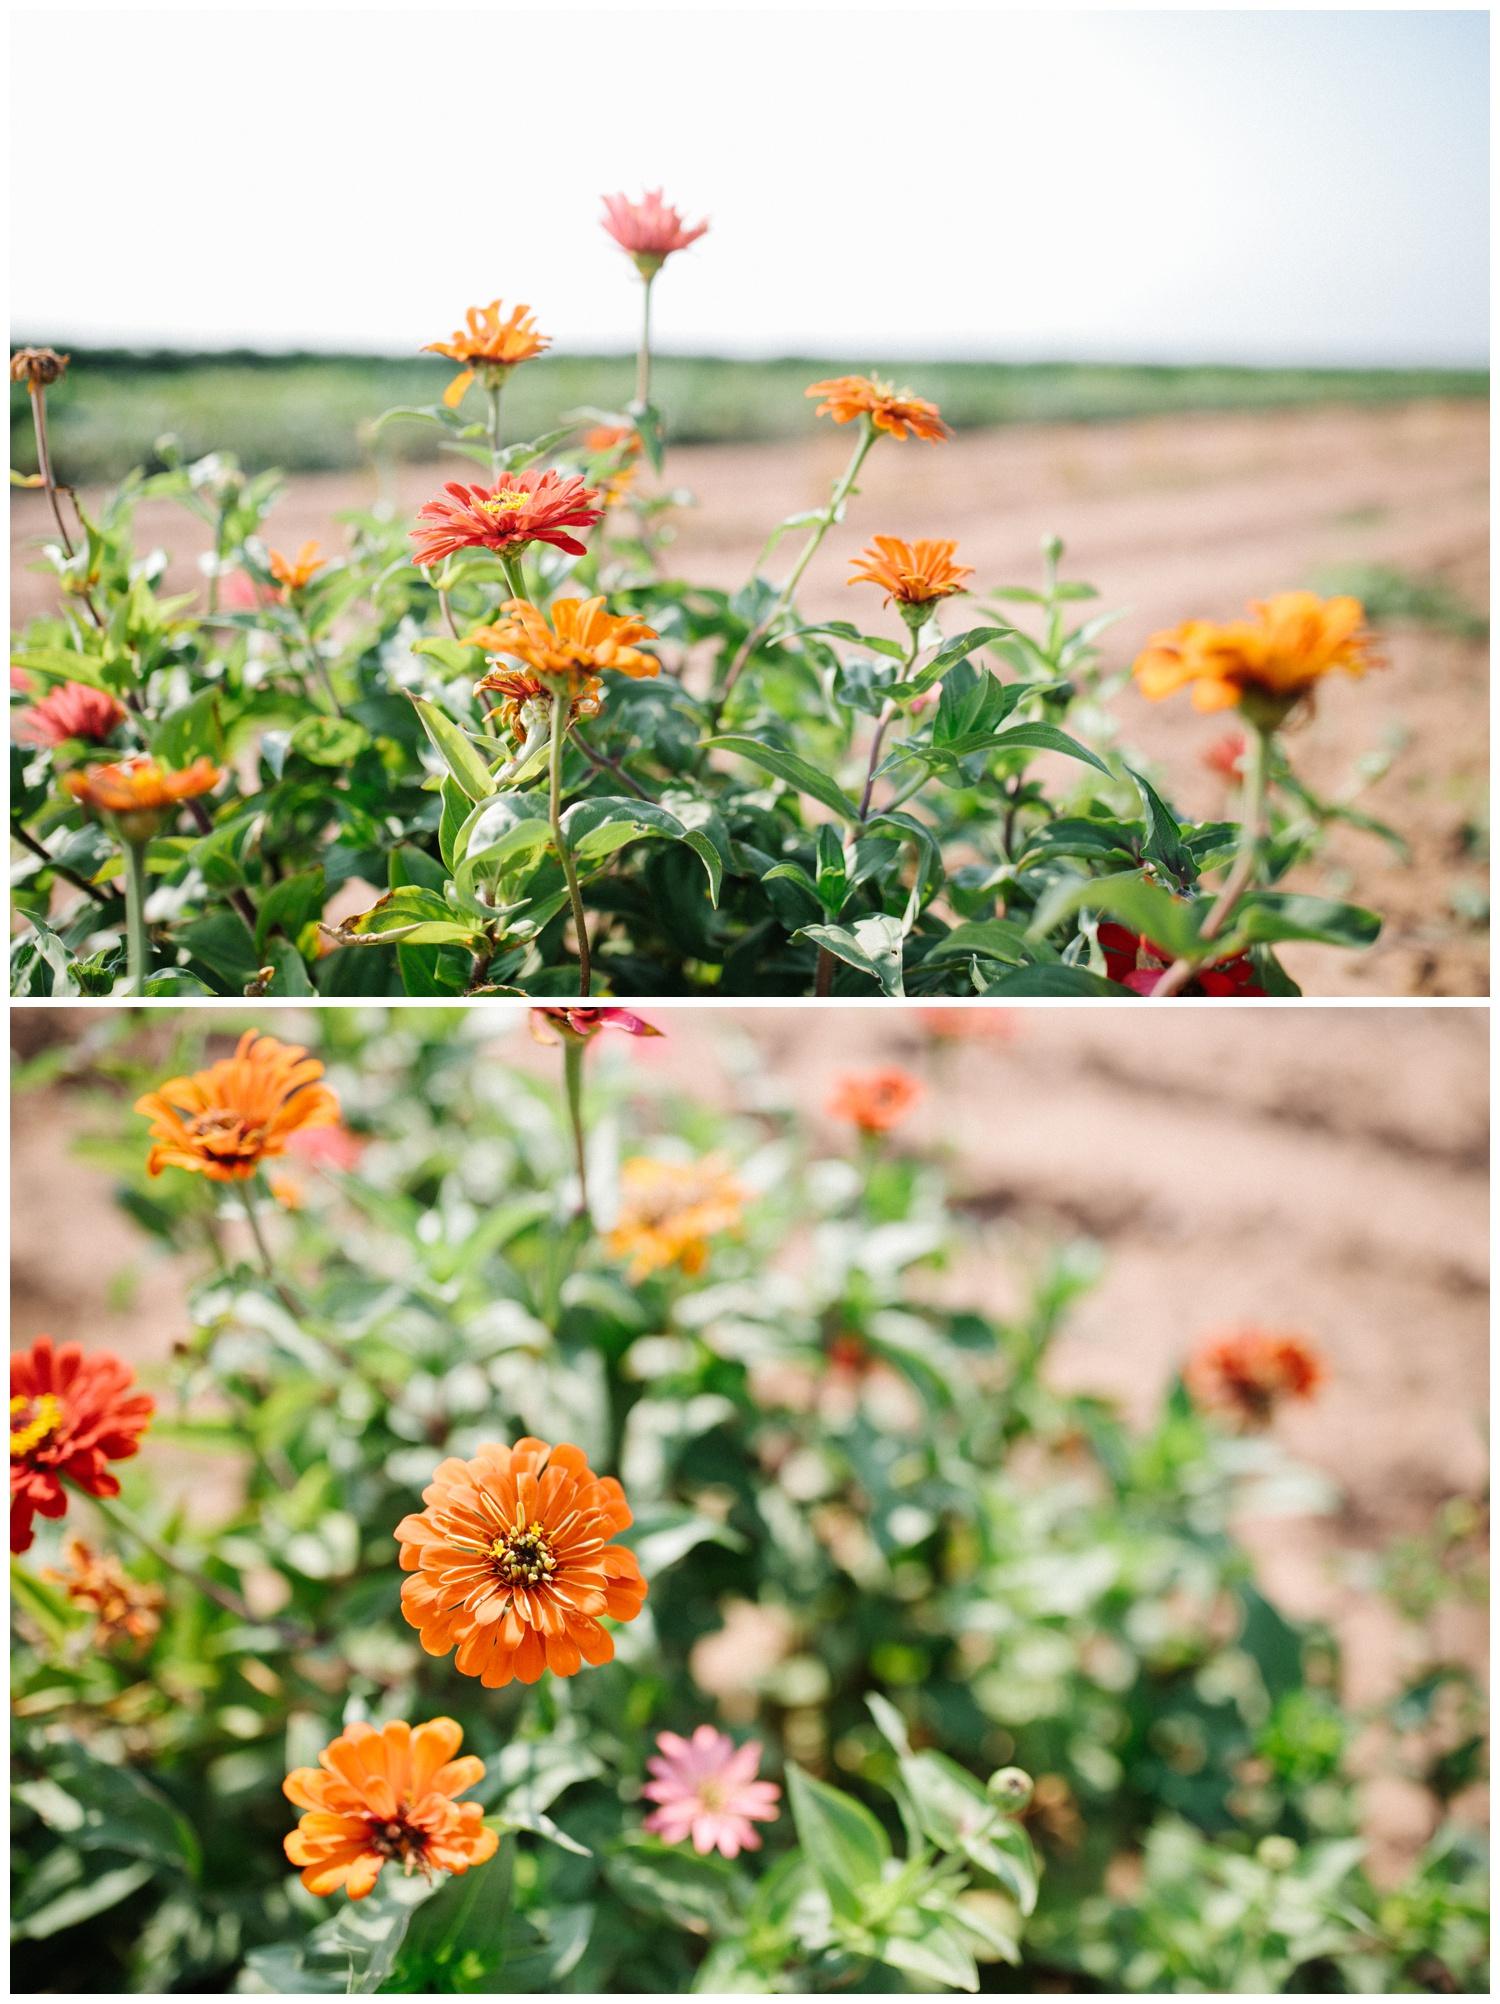 Reimer Farms__Lubbock Texas produce garden_45.jpg